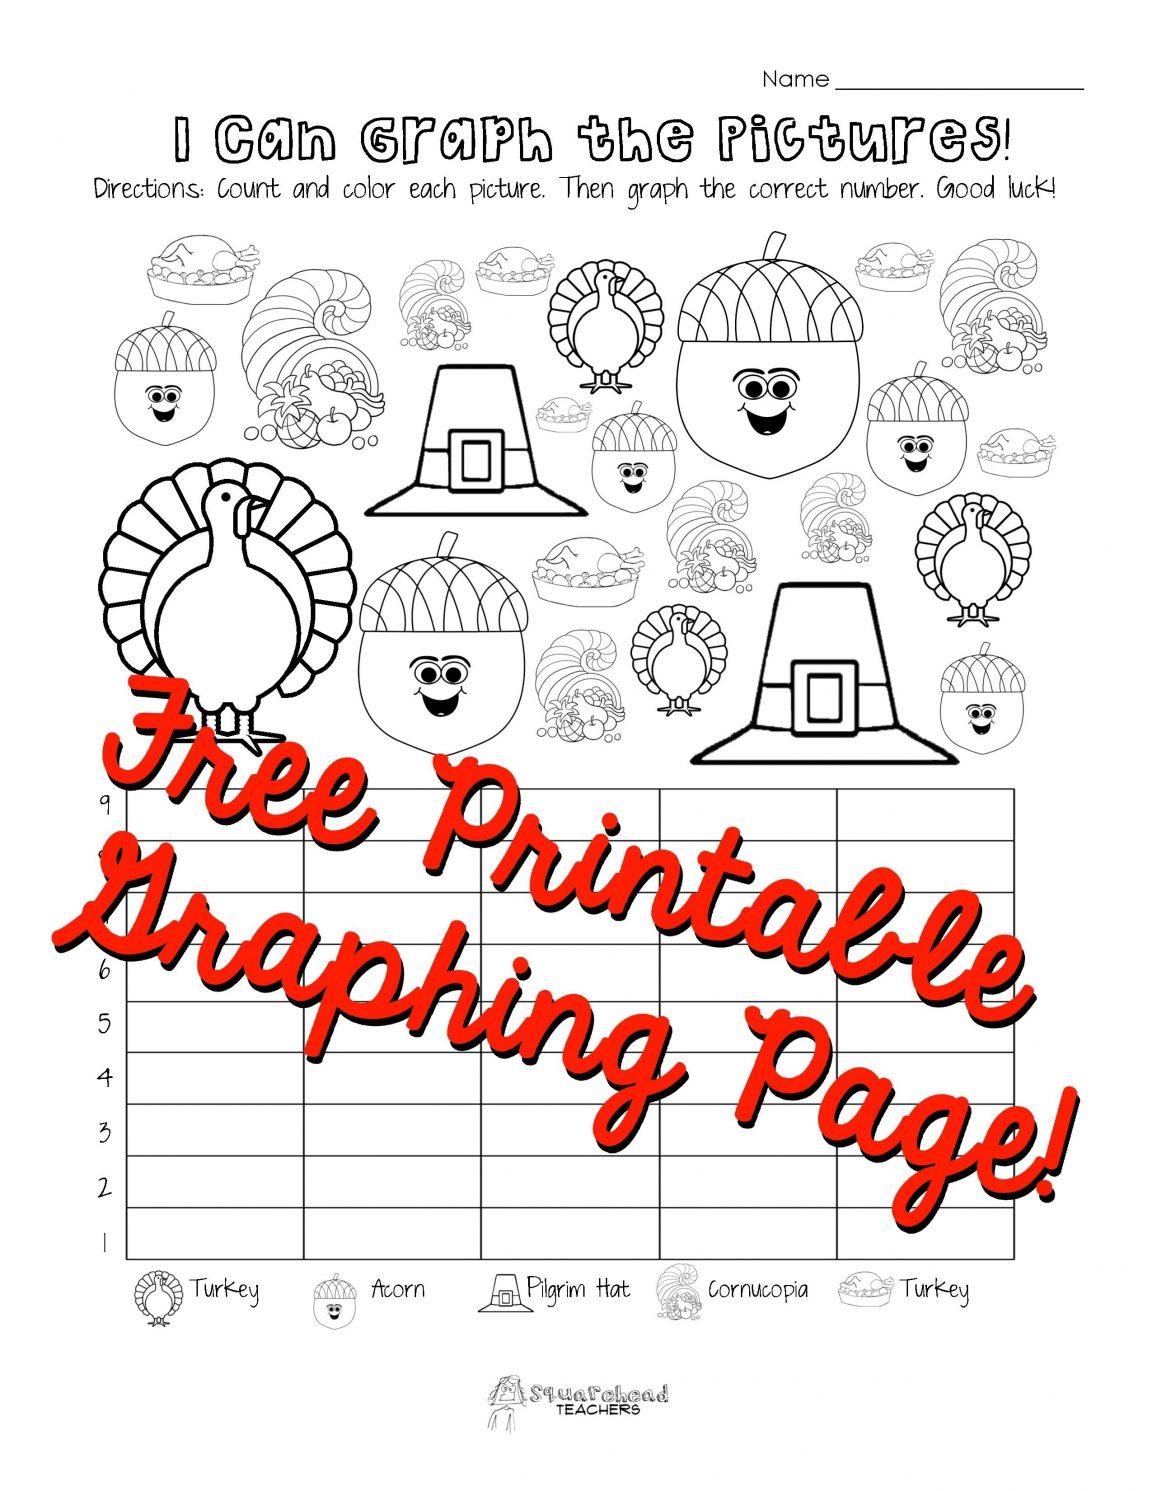 Free Printable Third Grade Math Worksheets Math Worksheets Free - Free Printable Thanksgiving Math Worksheets For 3Rd Grade